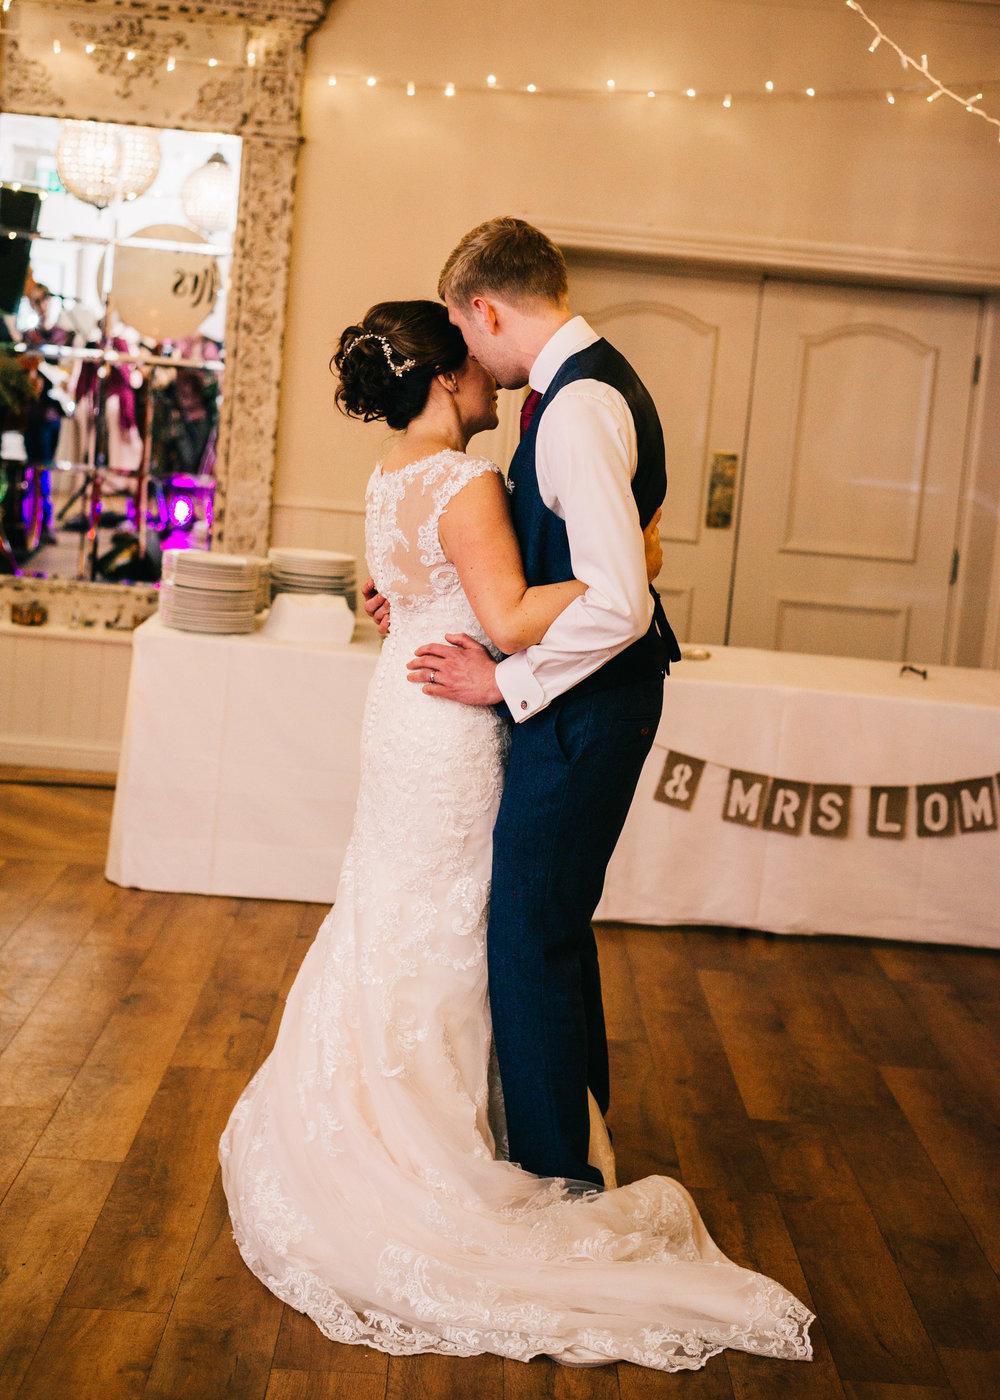 Shireburn Arms Wedding Hurst Green, Ribble Valley, Lancashire46